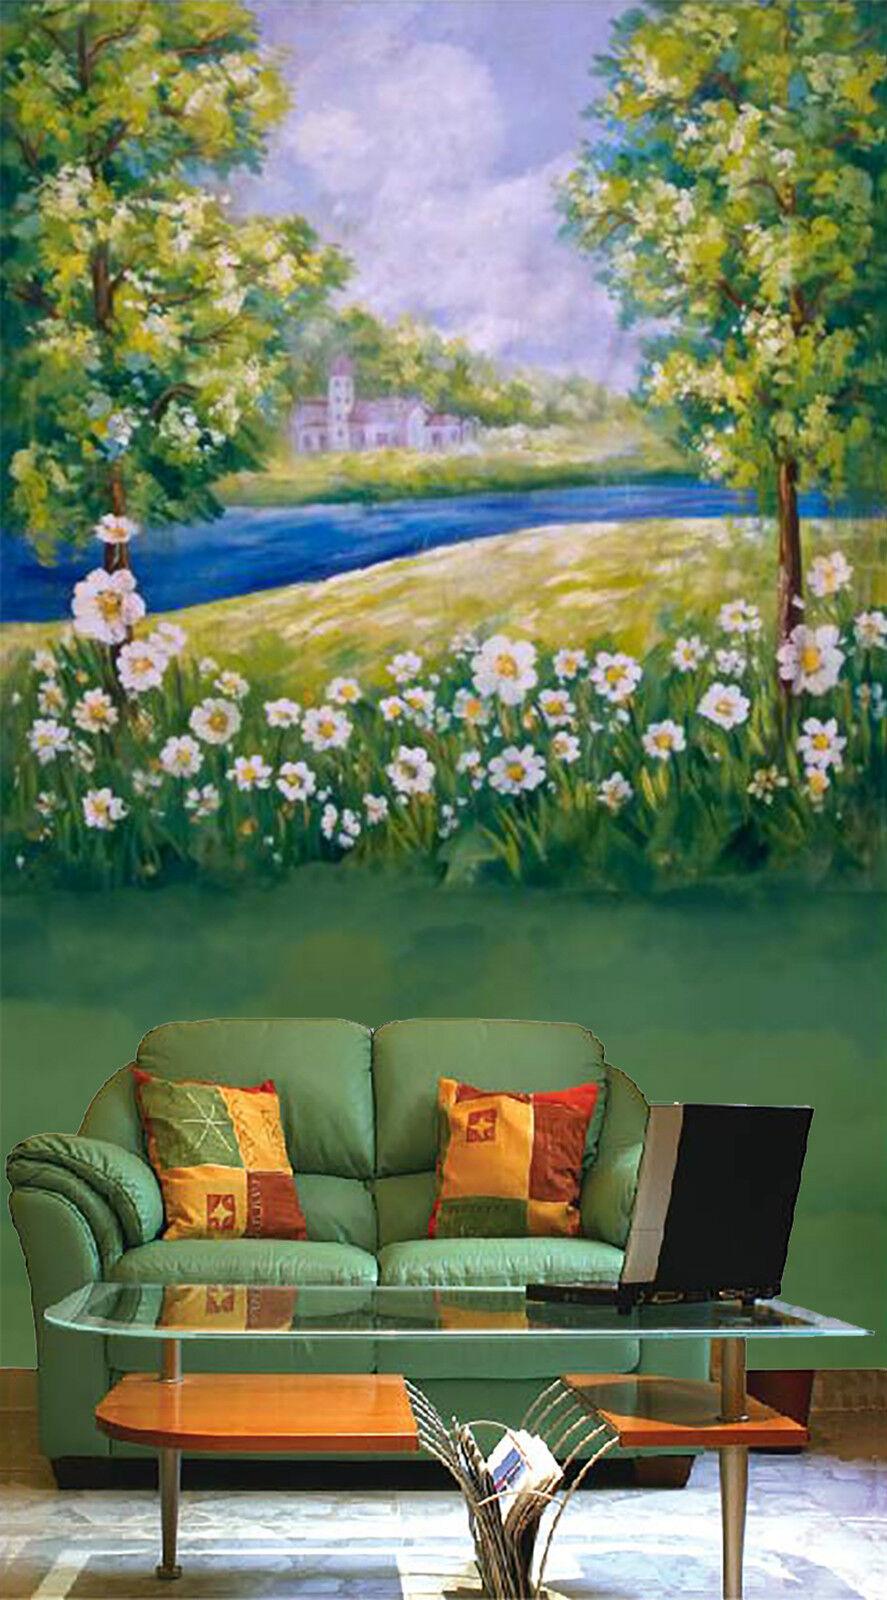 3D greenflächen 765 Fototapeten Wandbild Fototapete Bild Tapete Familie Kinder DE